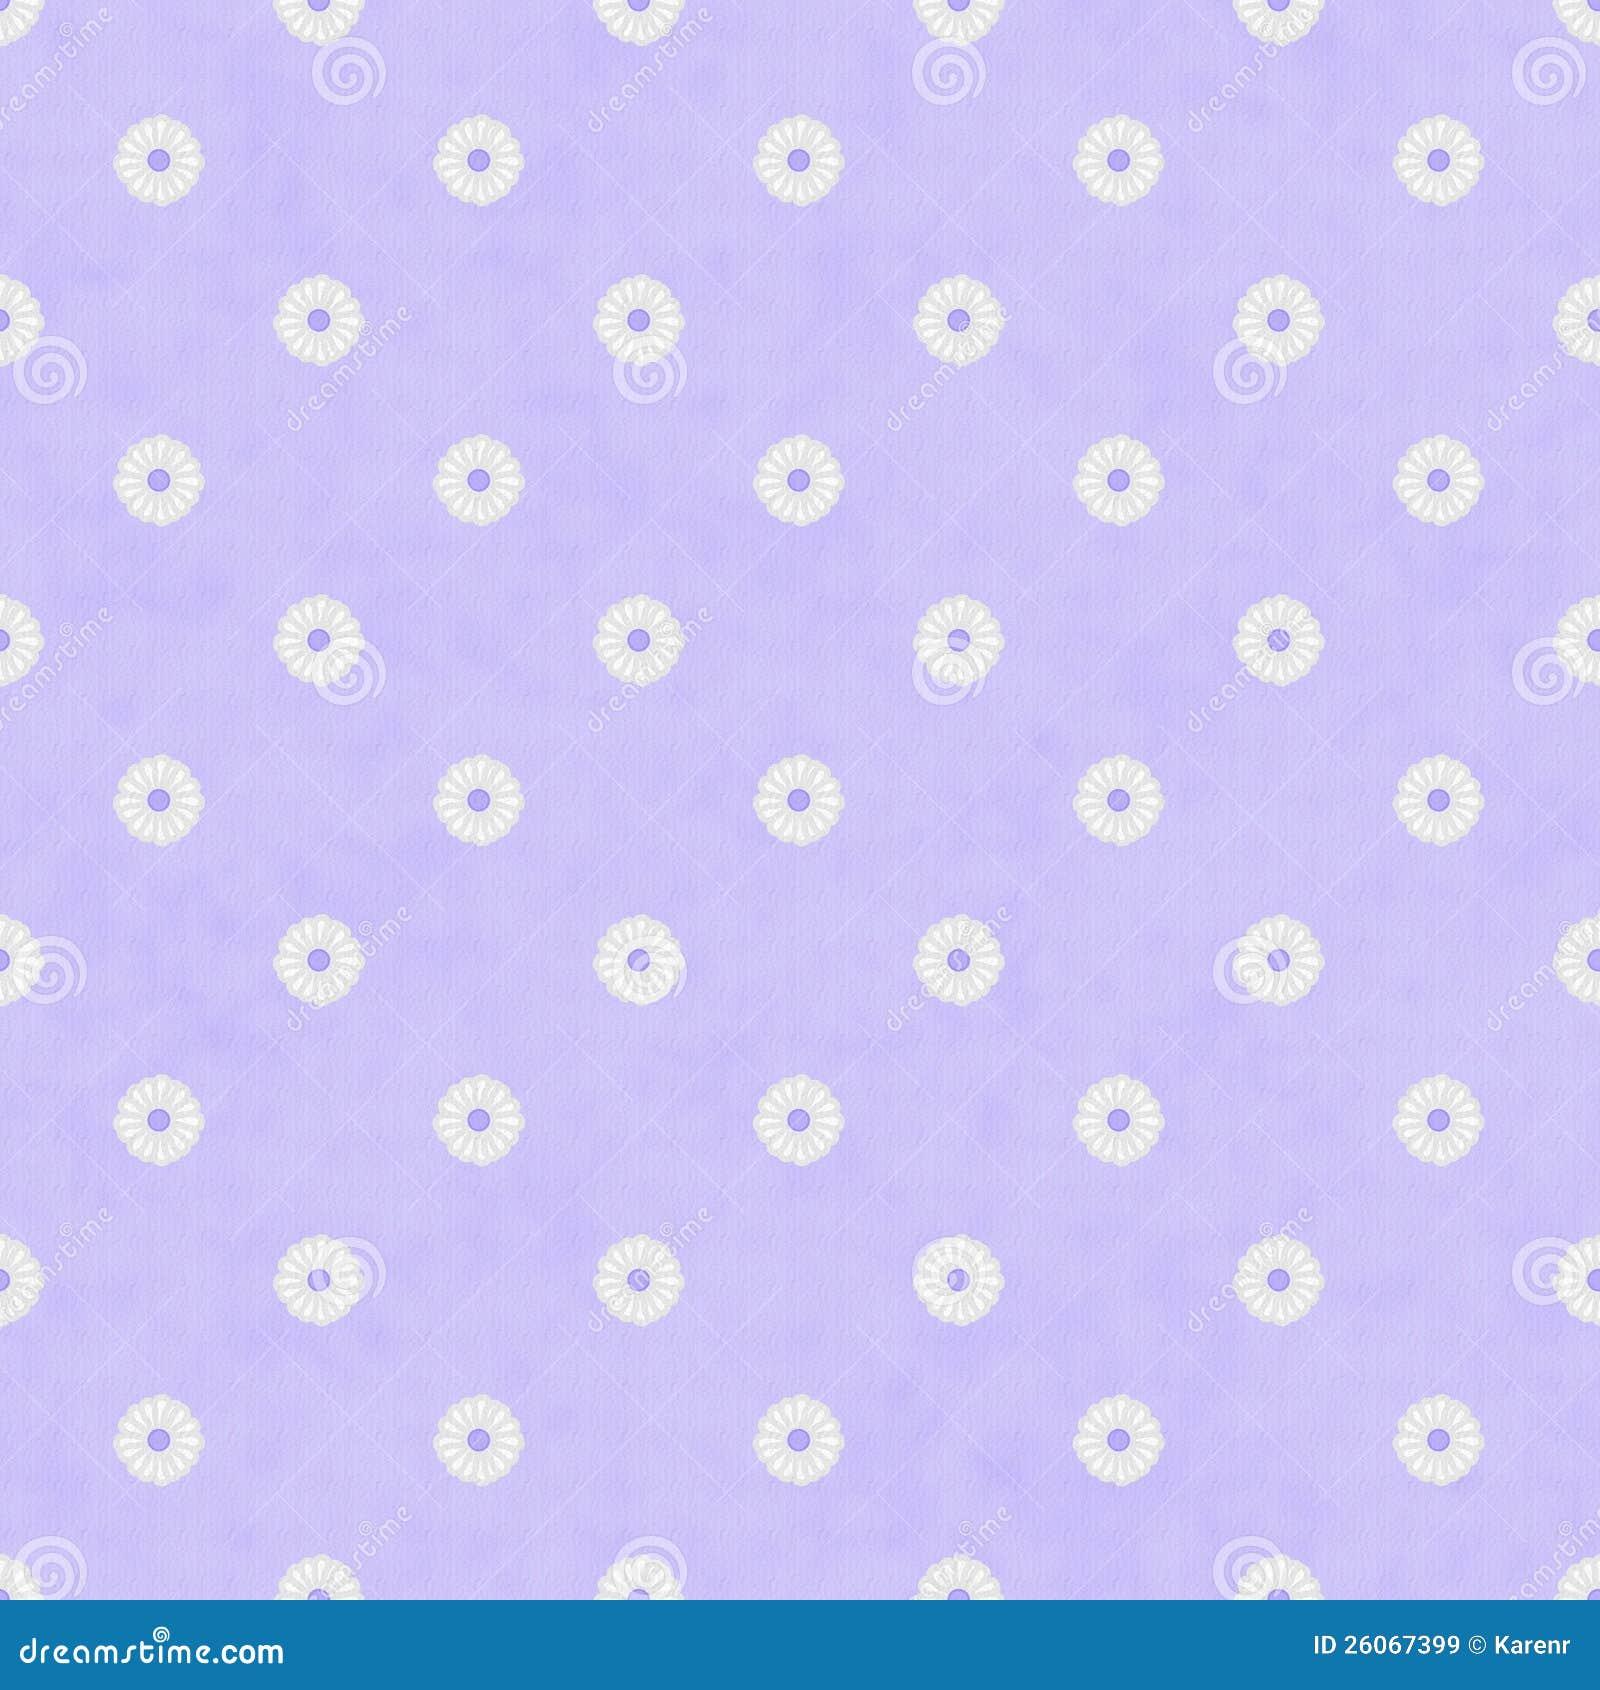 css div wrapper background image Gl6G